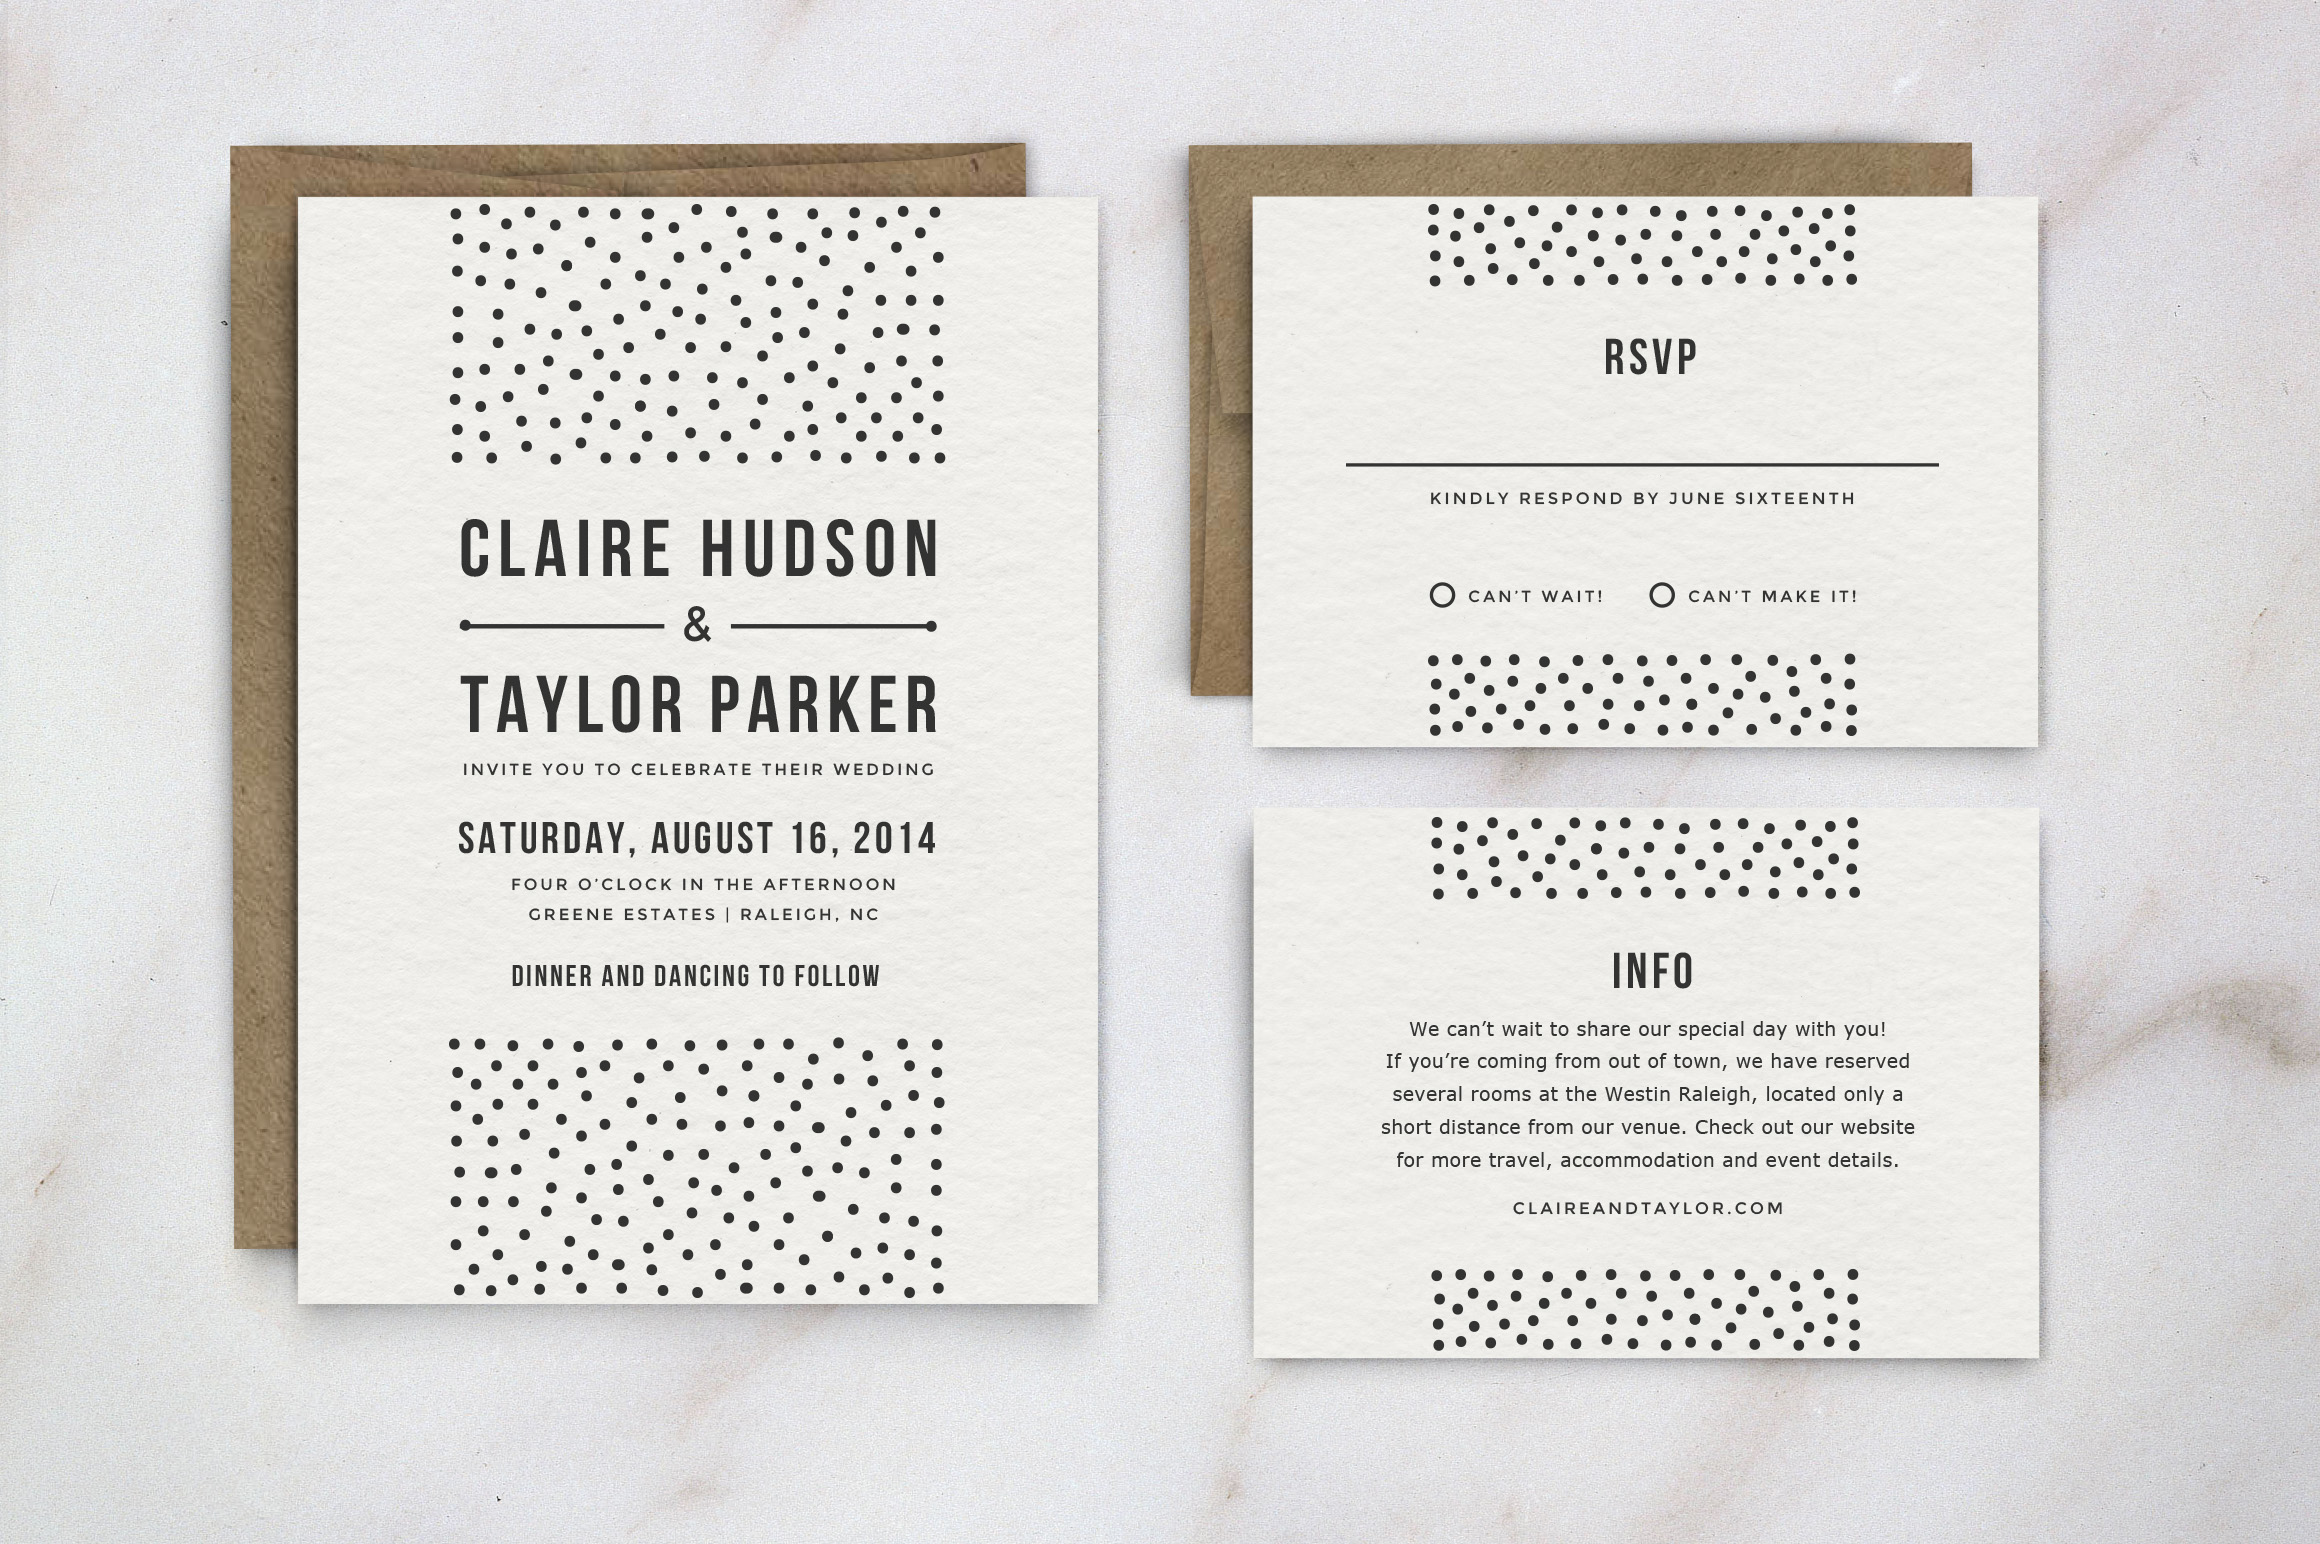 Customizable Wedding Invitation Templates: Wedding Invitation Template Suite